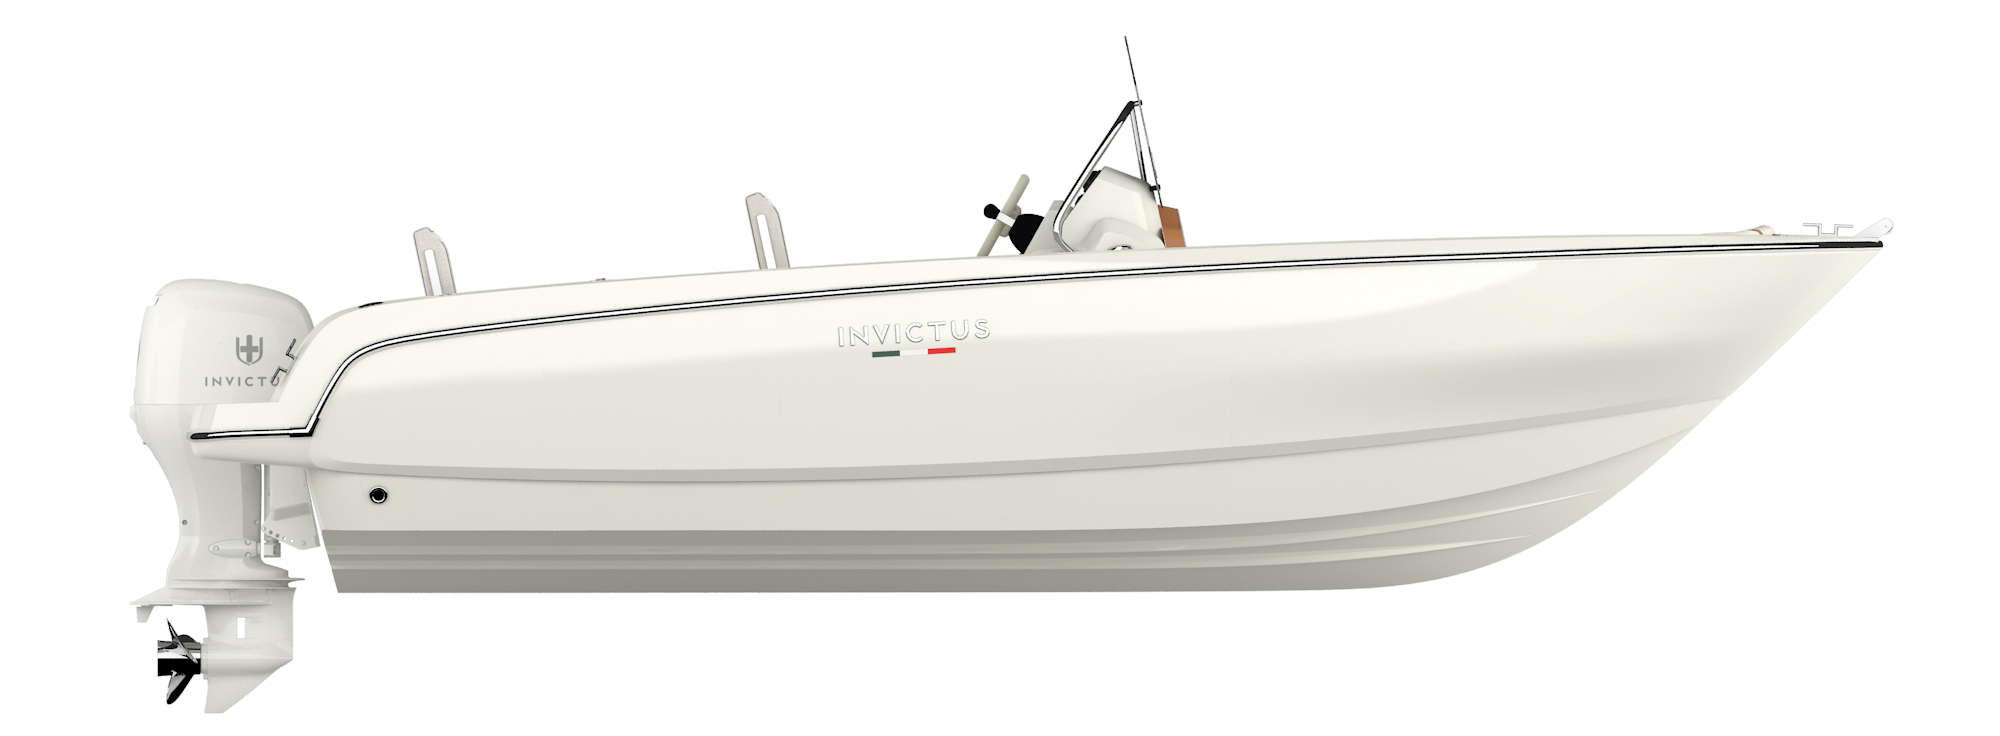 190FX V01 - PROFILO - Personal White - 02